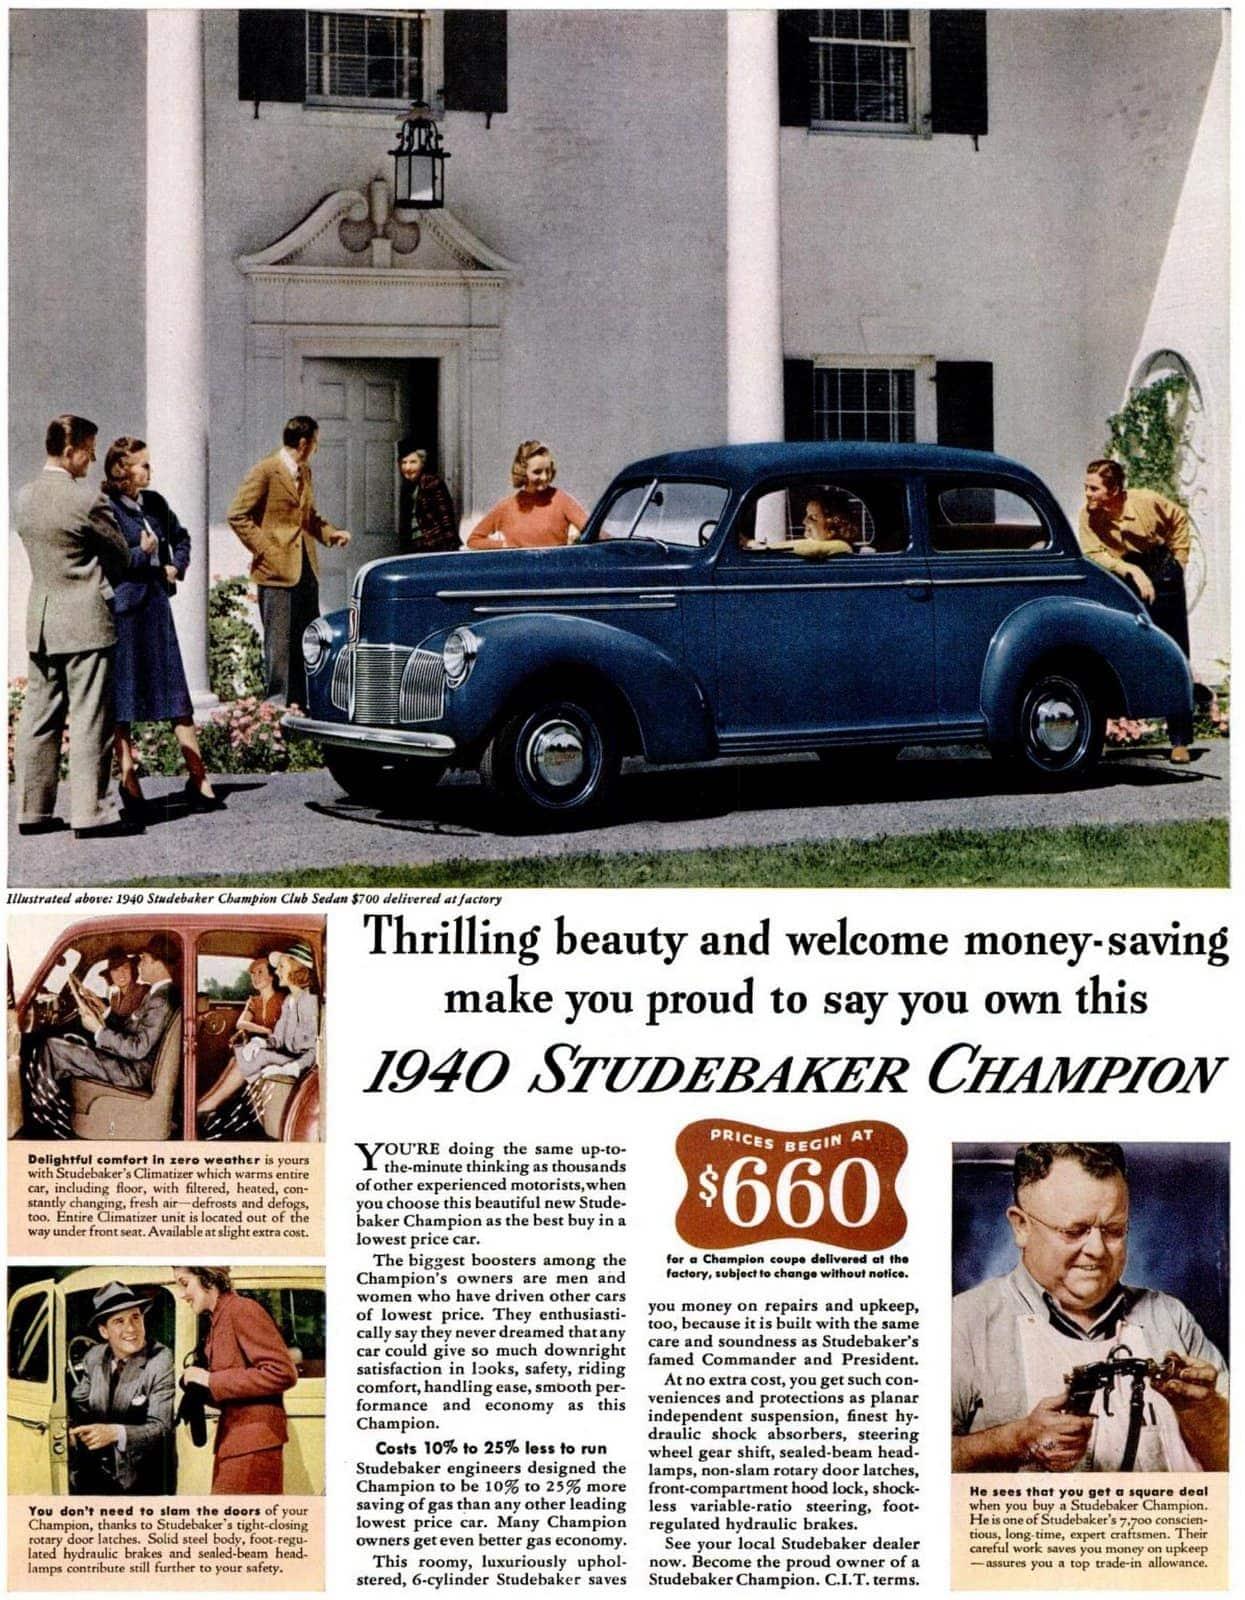 1940 Studebaker Champion cars